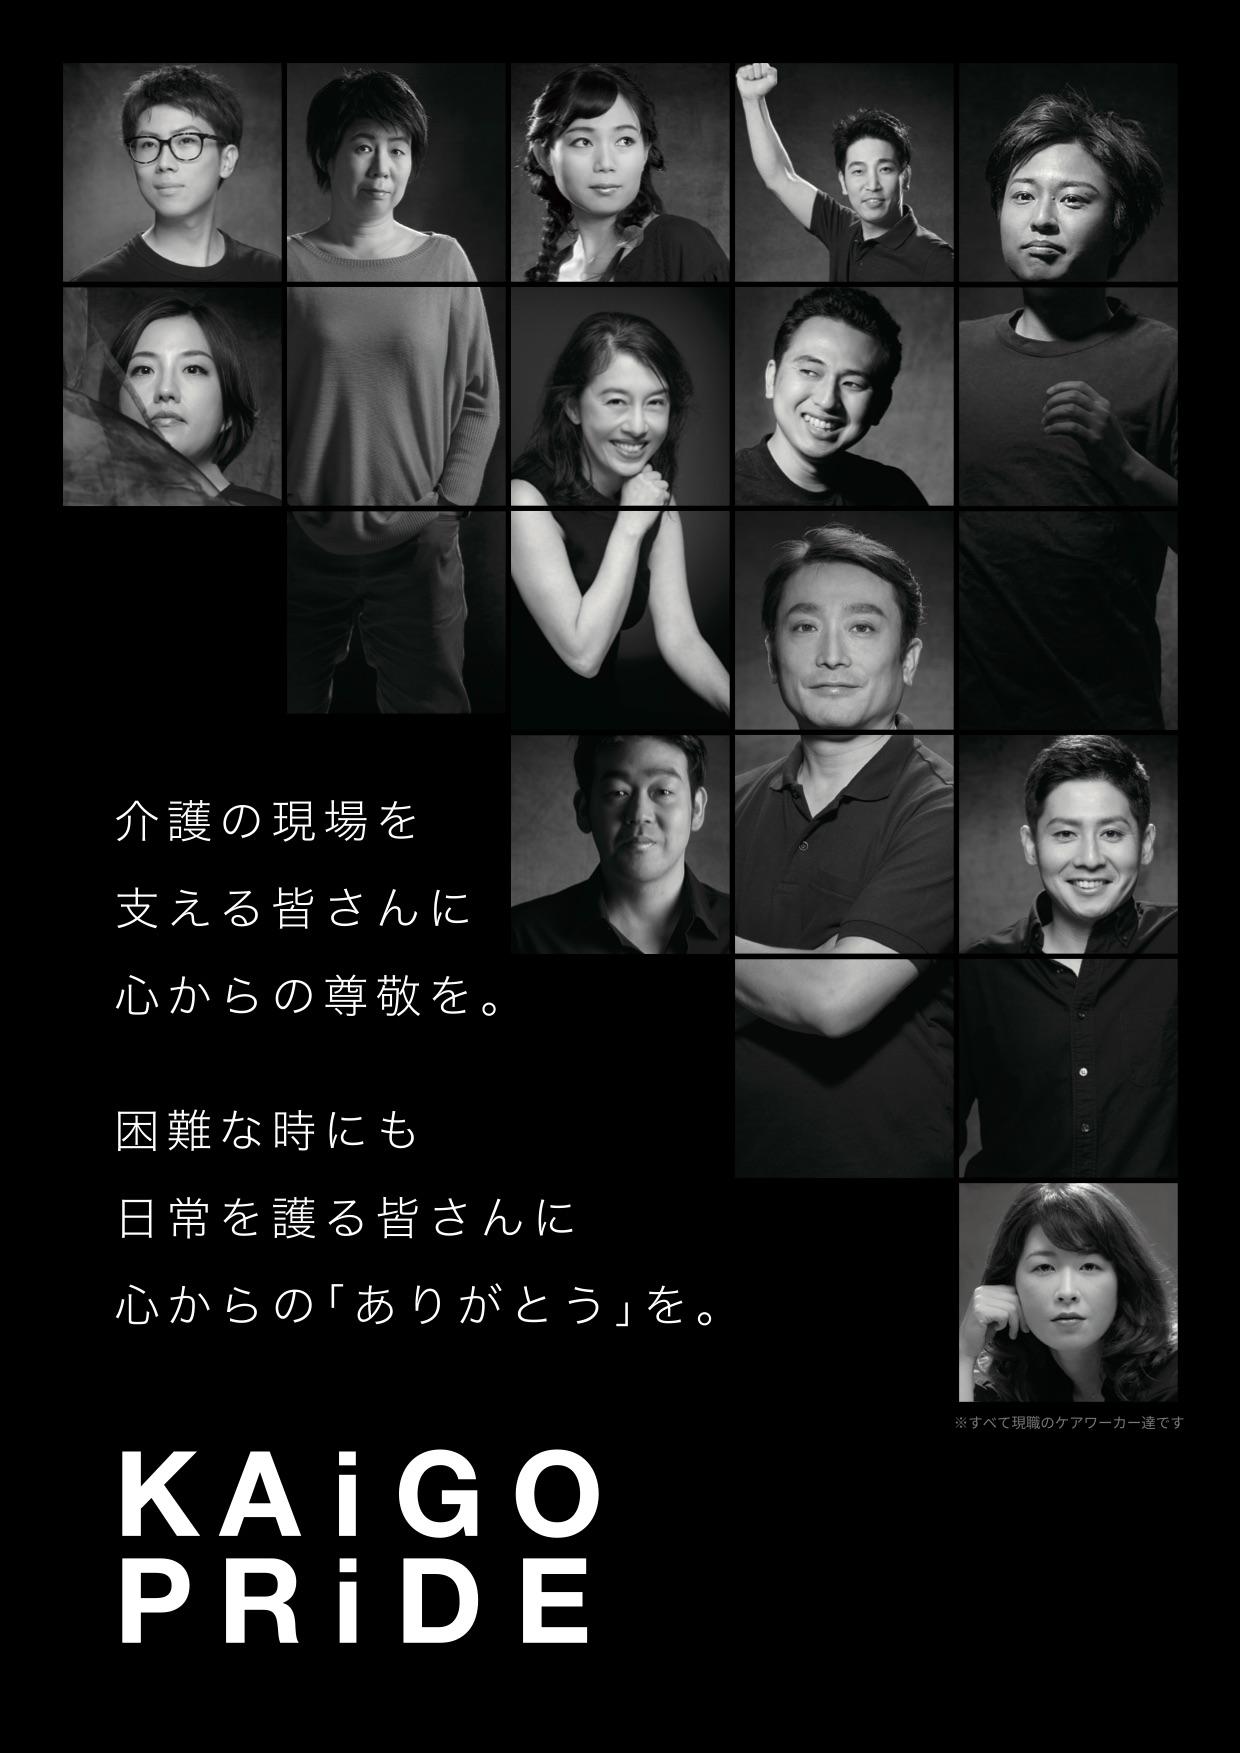 KAiGO PRiDE ありがとうポスター